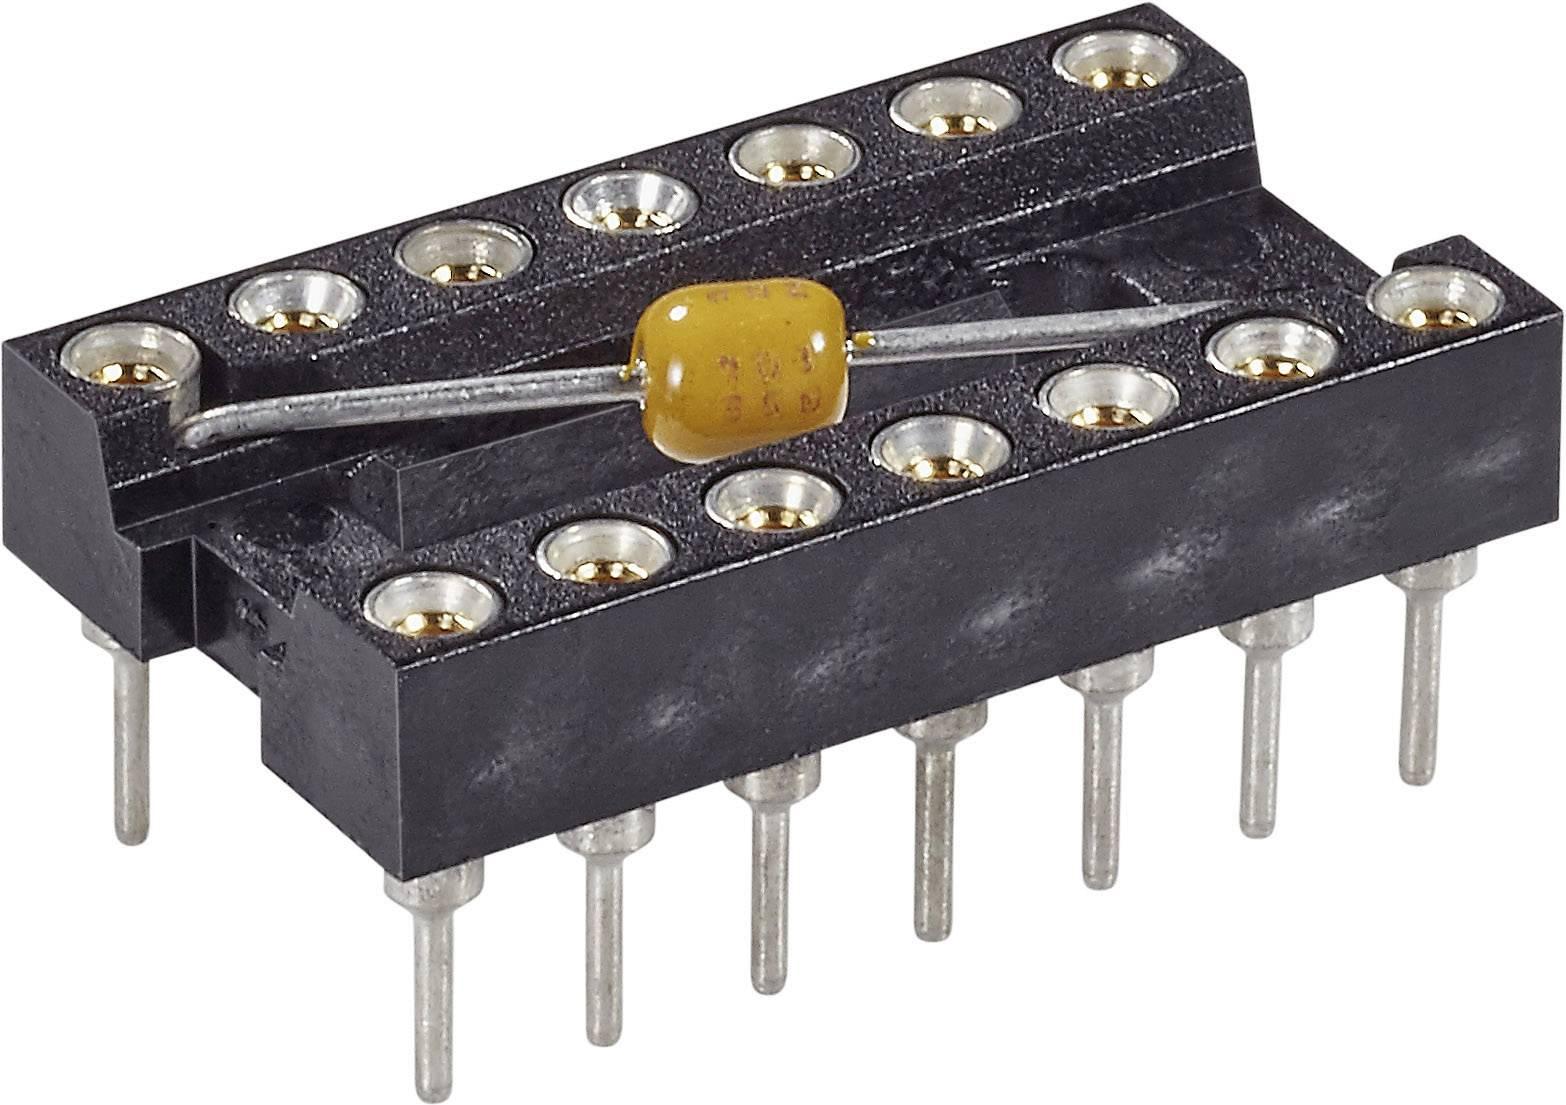 IC pätica MPE Garry 001-3-016-3-B1STF-XT0 presné kontakty, s kondenzátorom, rozteč 7.62 mm, pólů 16, 1 ks